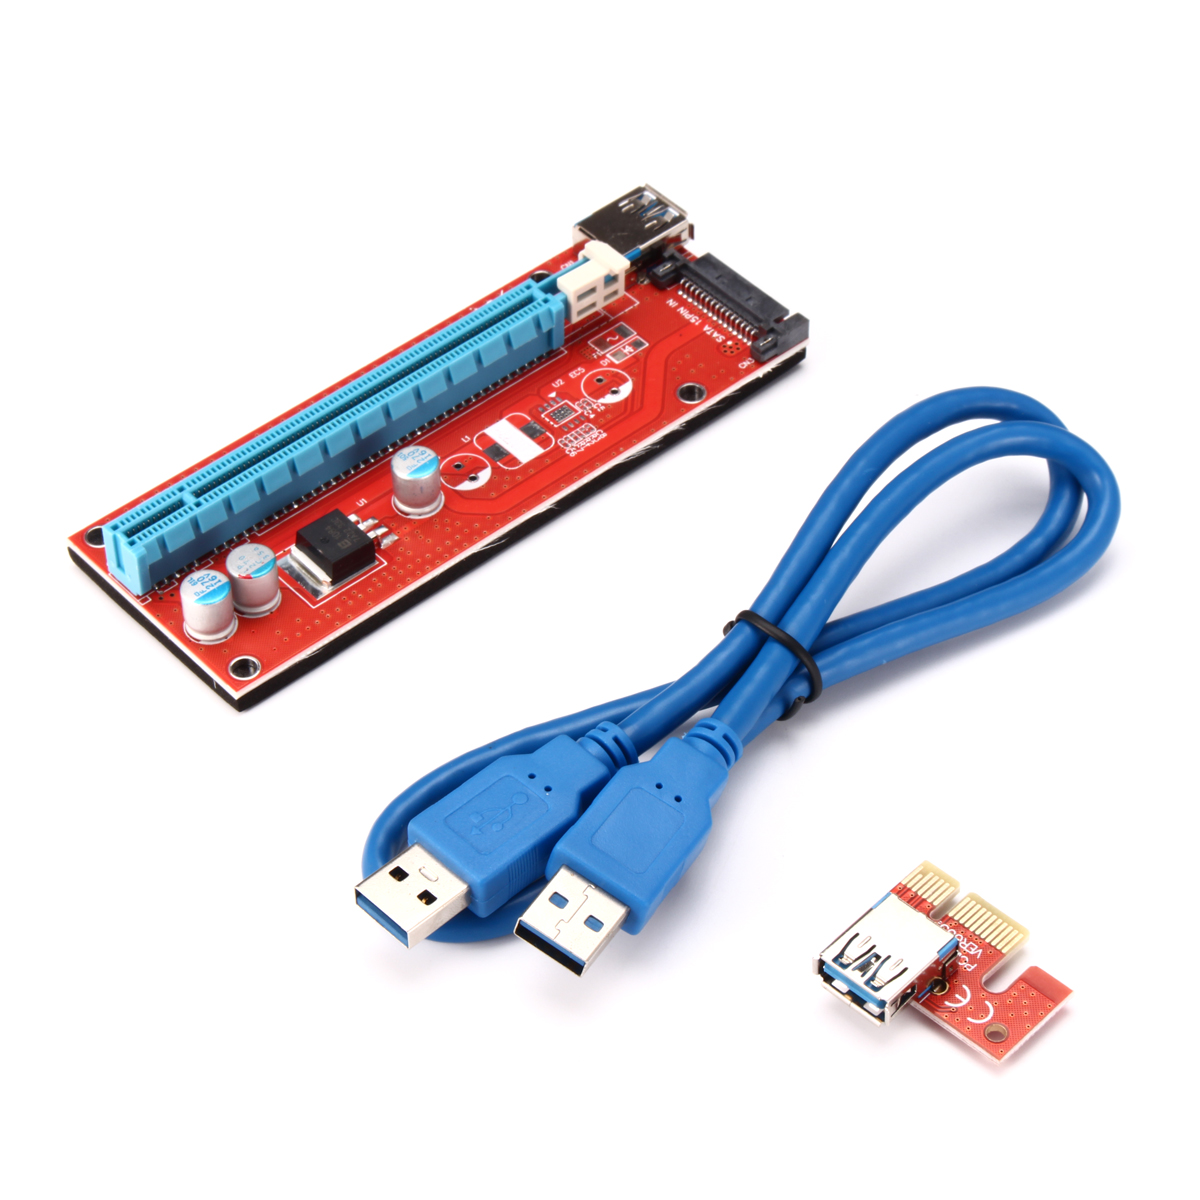 Mining 3.0 PCI-E 1x to 16x Extender Board Riser Card Adapter GPU Cable SATA